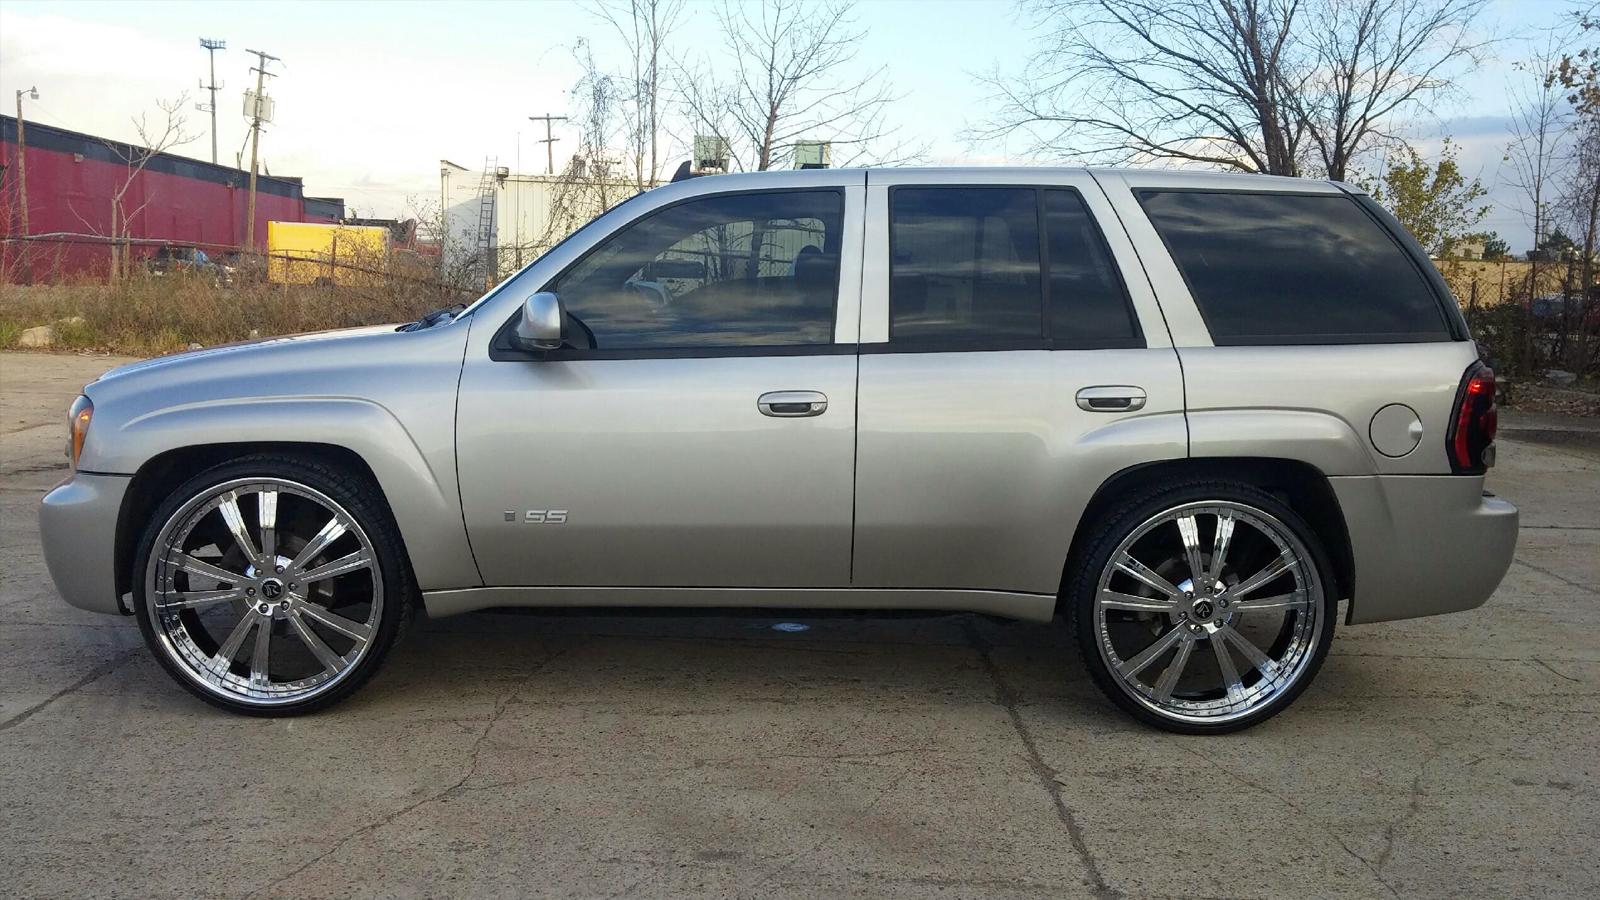 Chevrolet Trailblazer Raggio Gallery - RNR Wheels